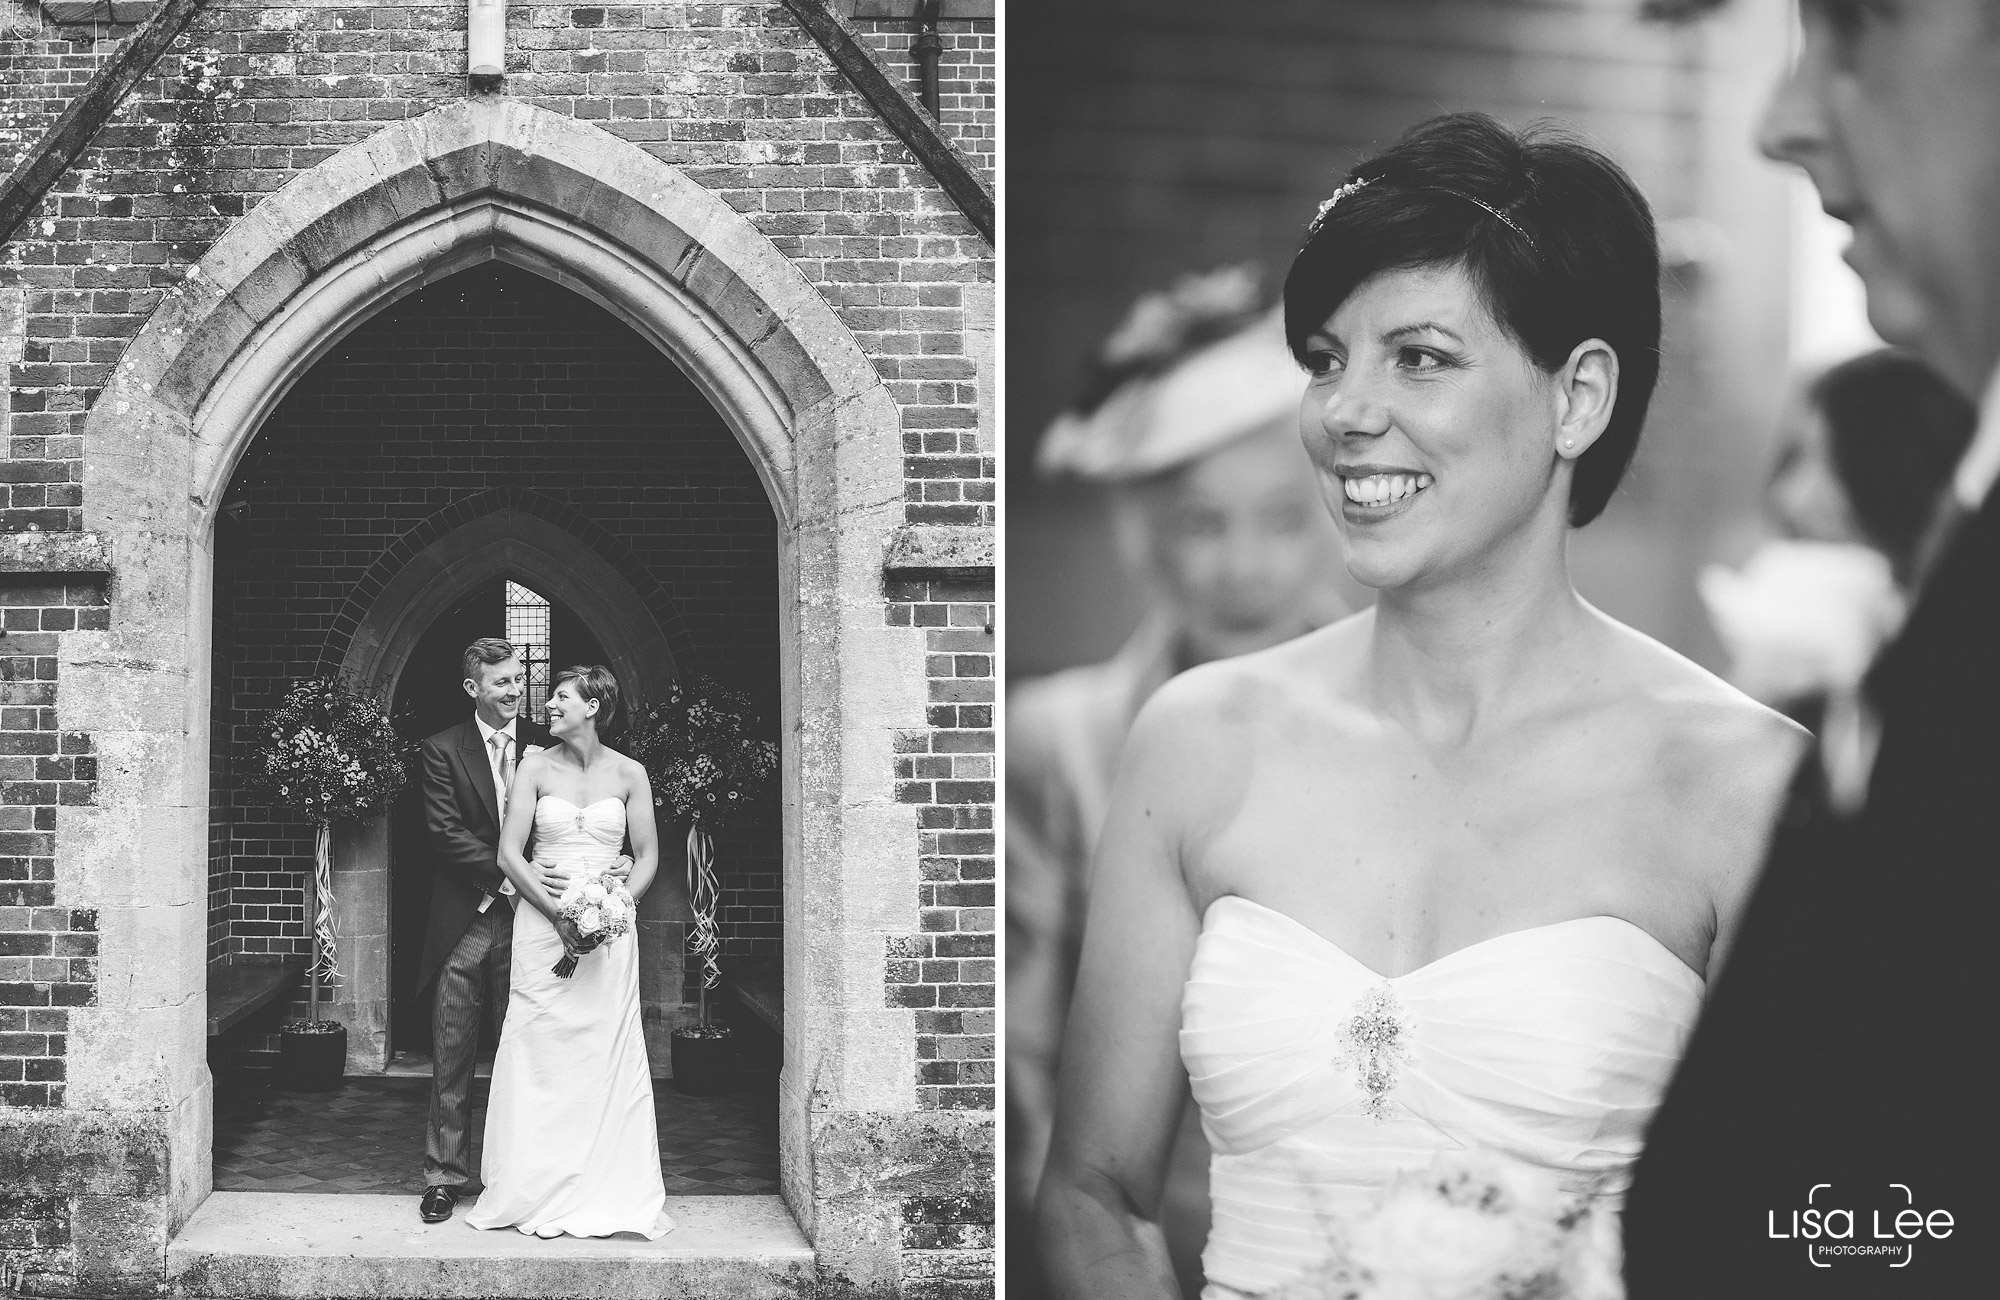 lisa-lee-wedding-photography-burton-church.jpg